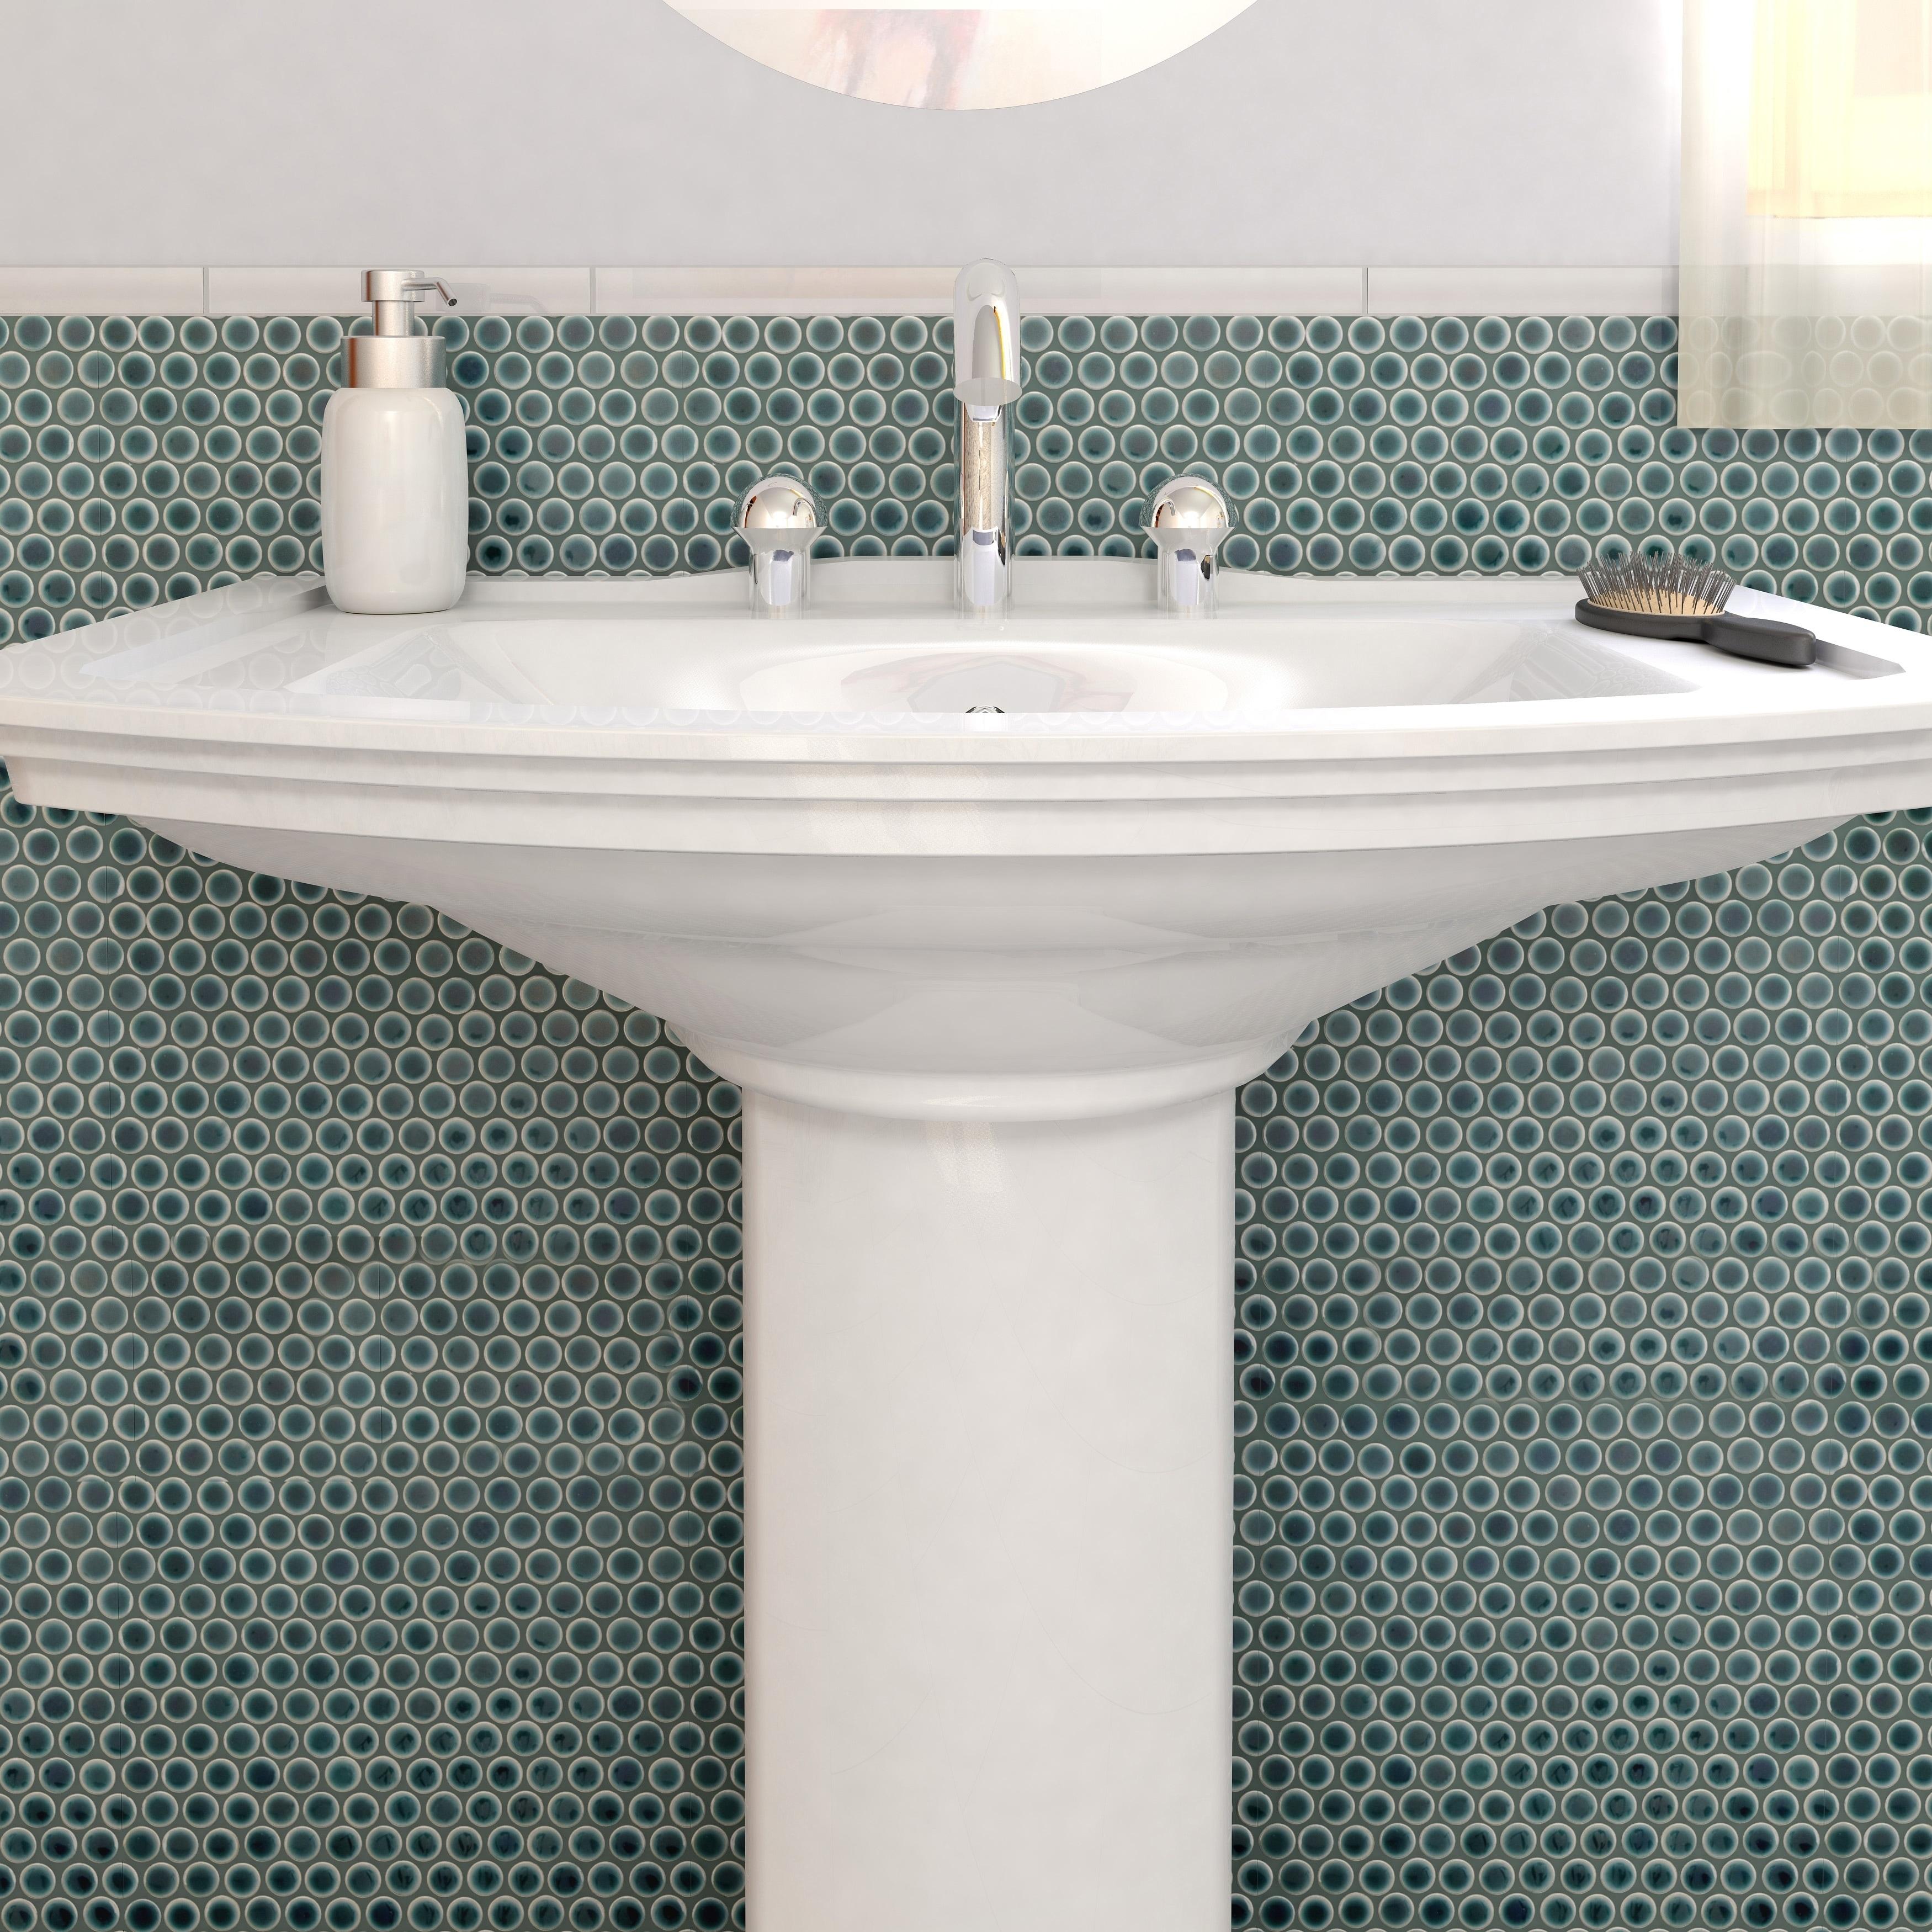 Shop SomerTile Penny Emerald Porcelain Mosaic Floor and Wall Tile ...